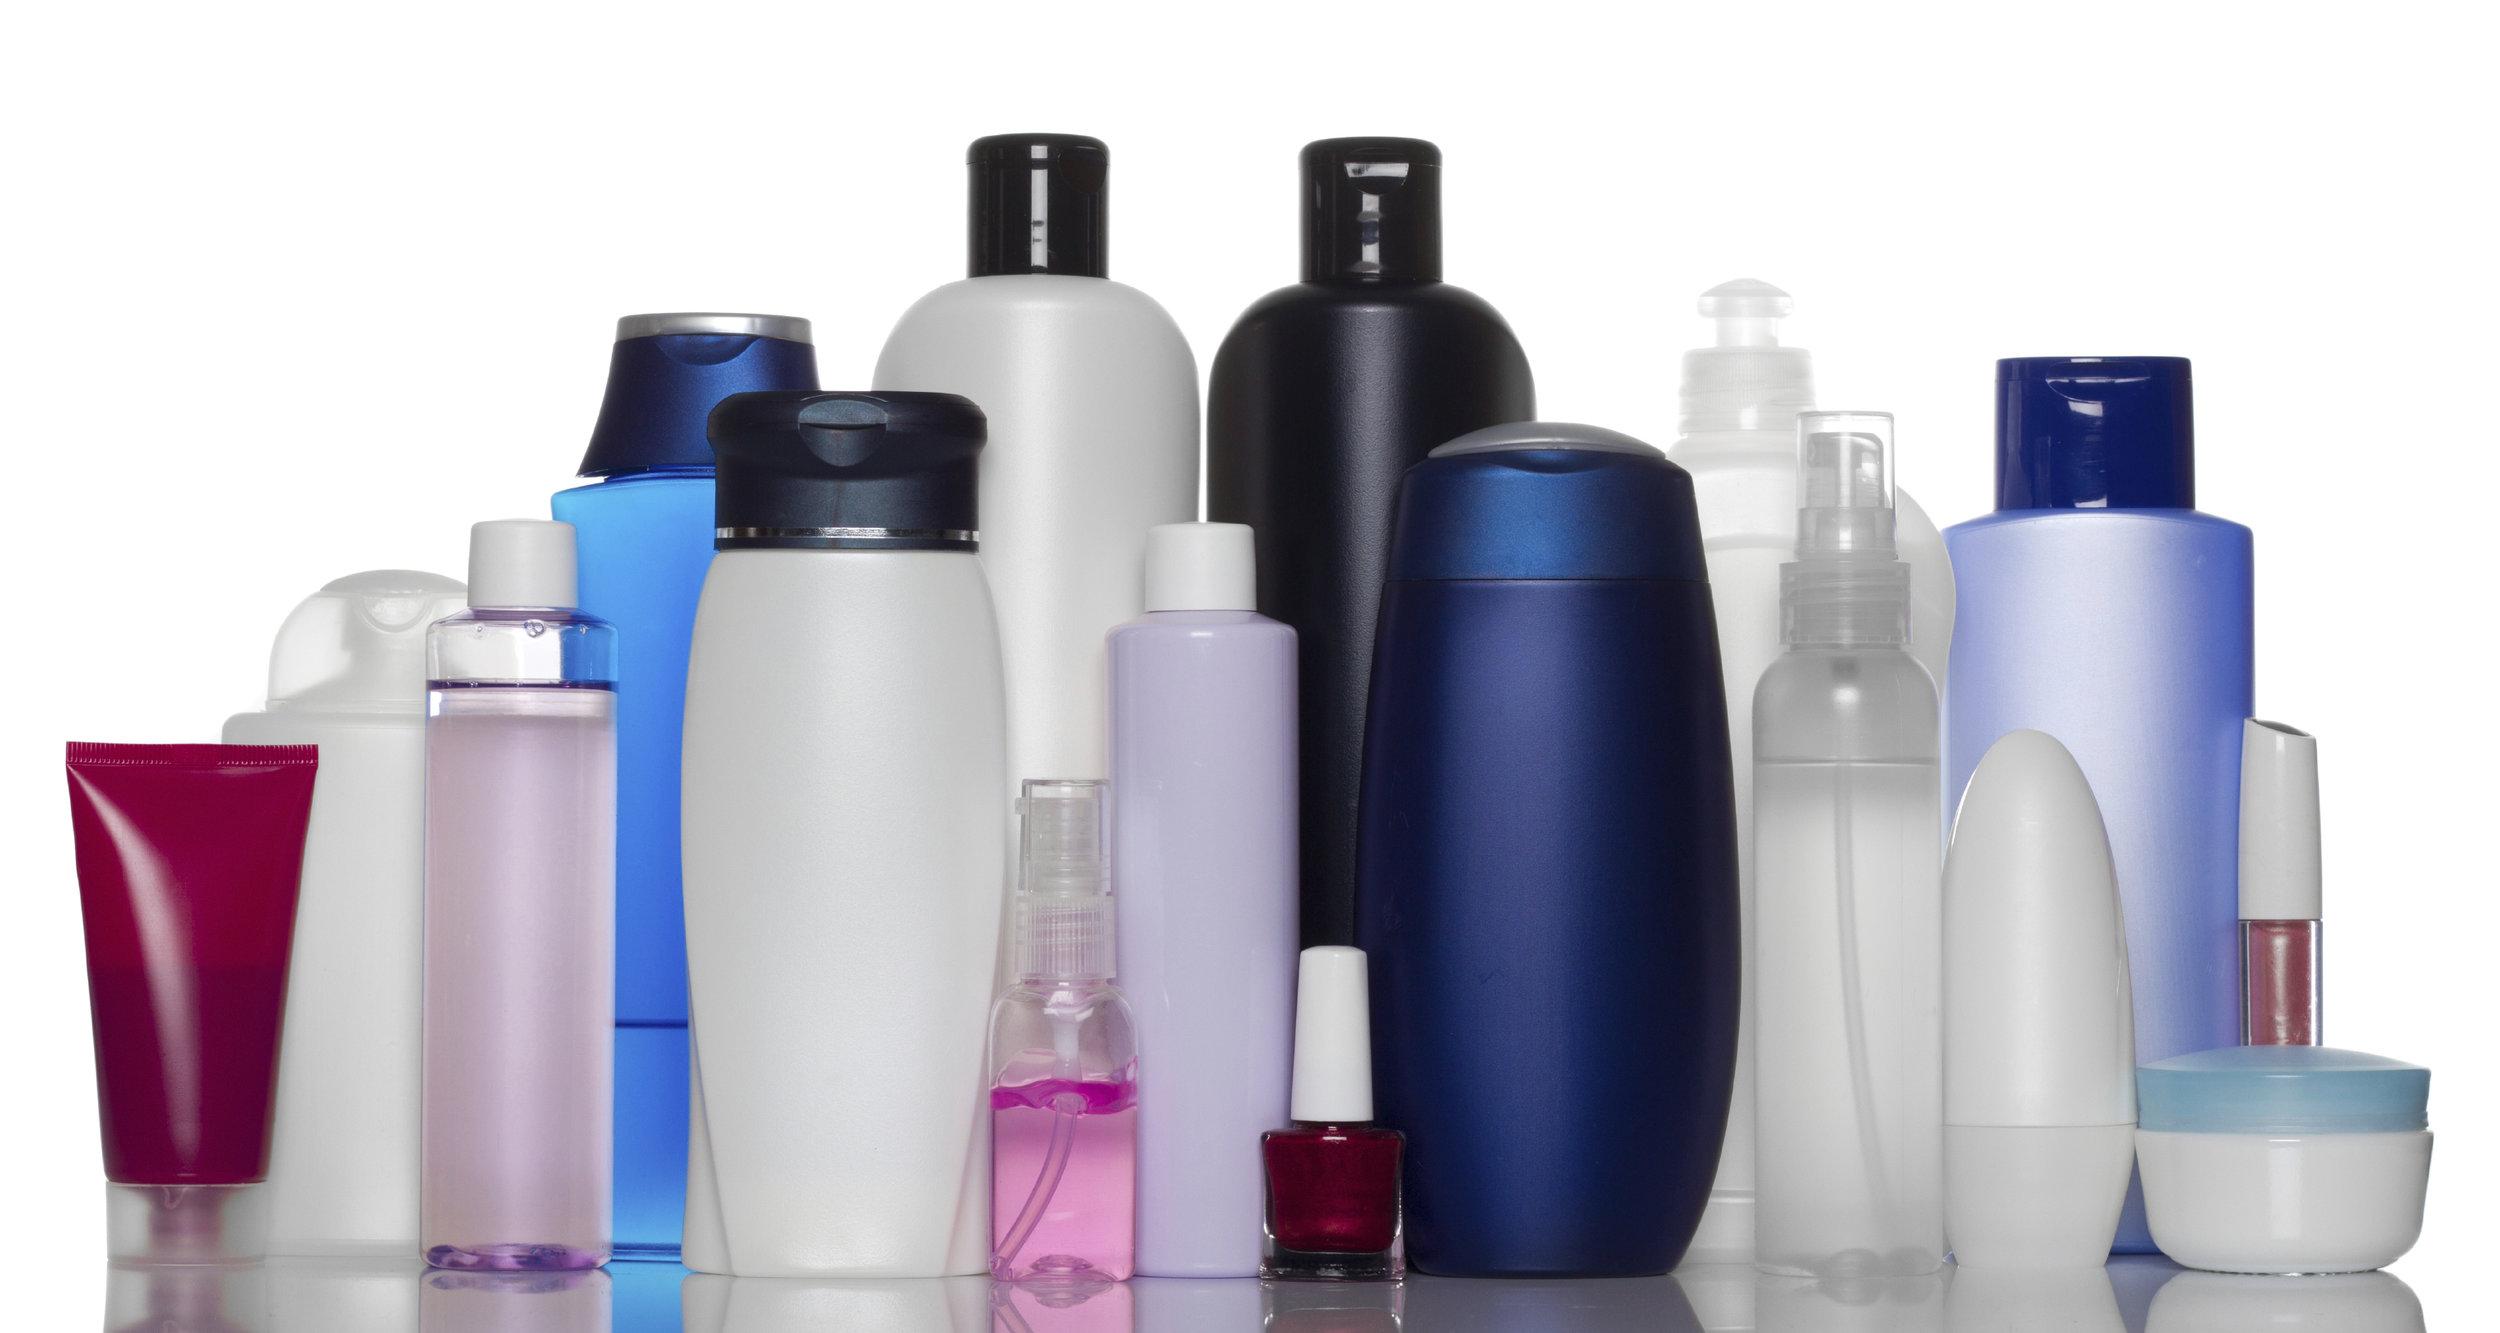 health-beauty-products.jpg